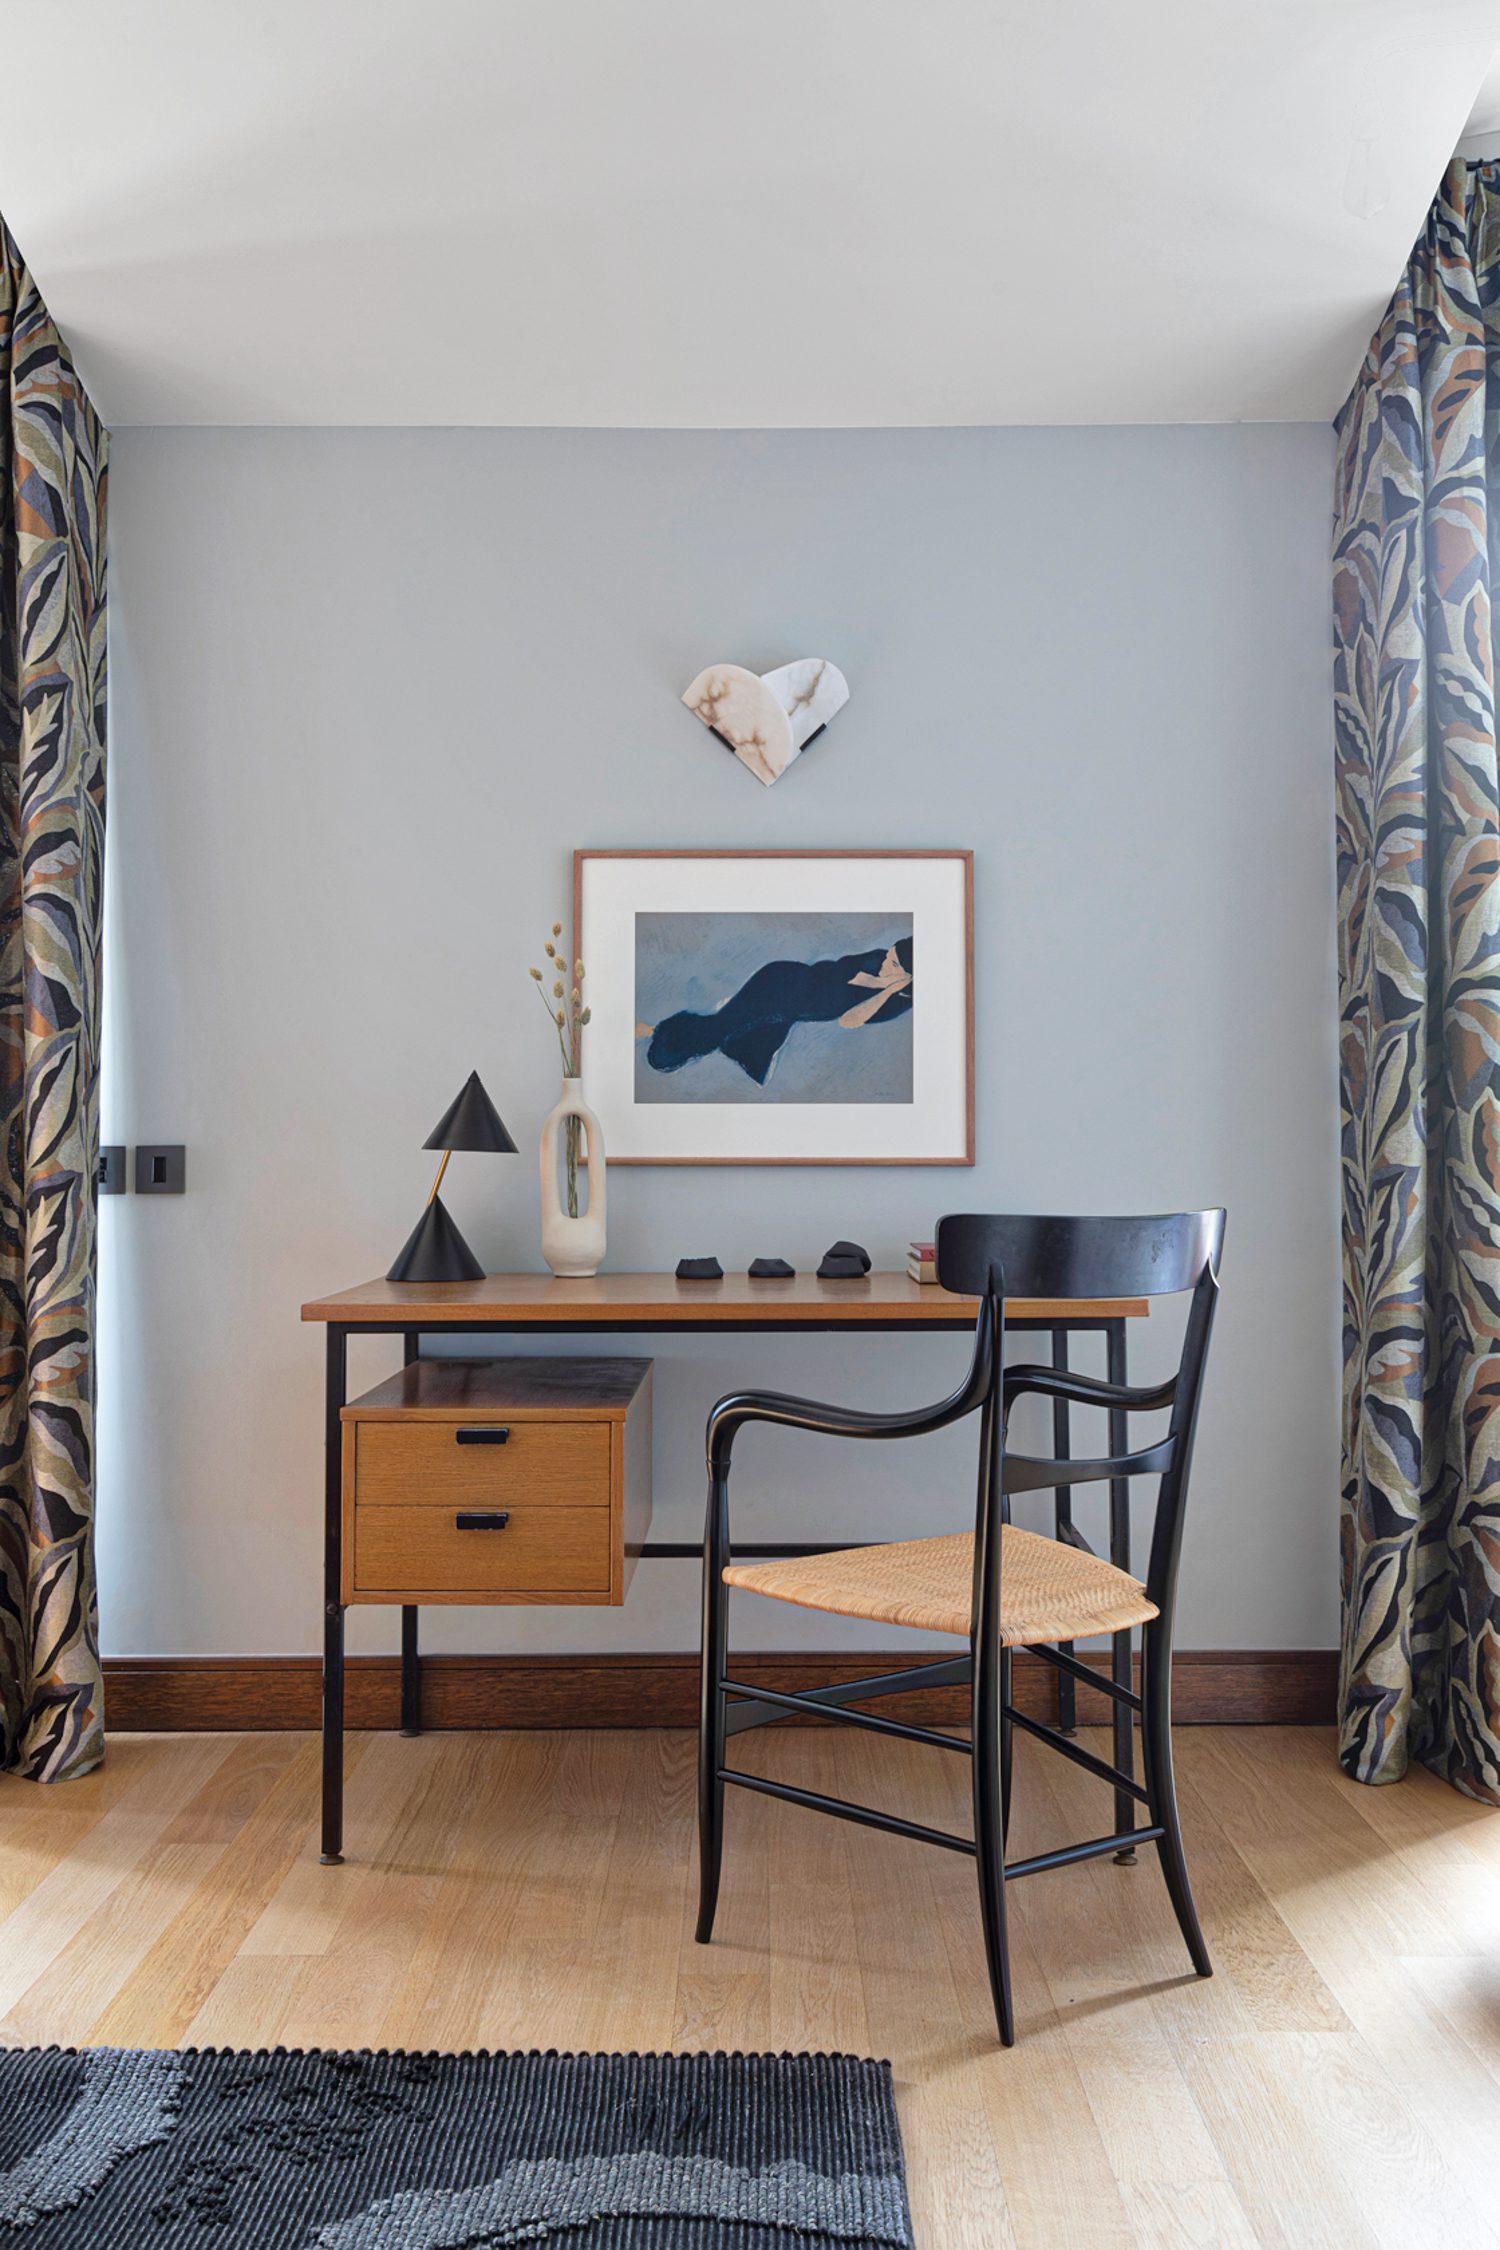 An oiled solid-oak bookshelf by Atelier Areti stands in the mezzanine.